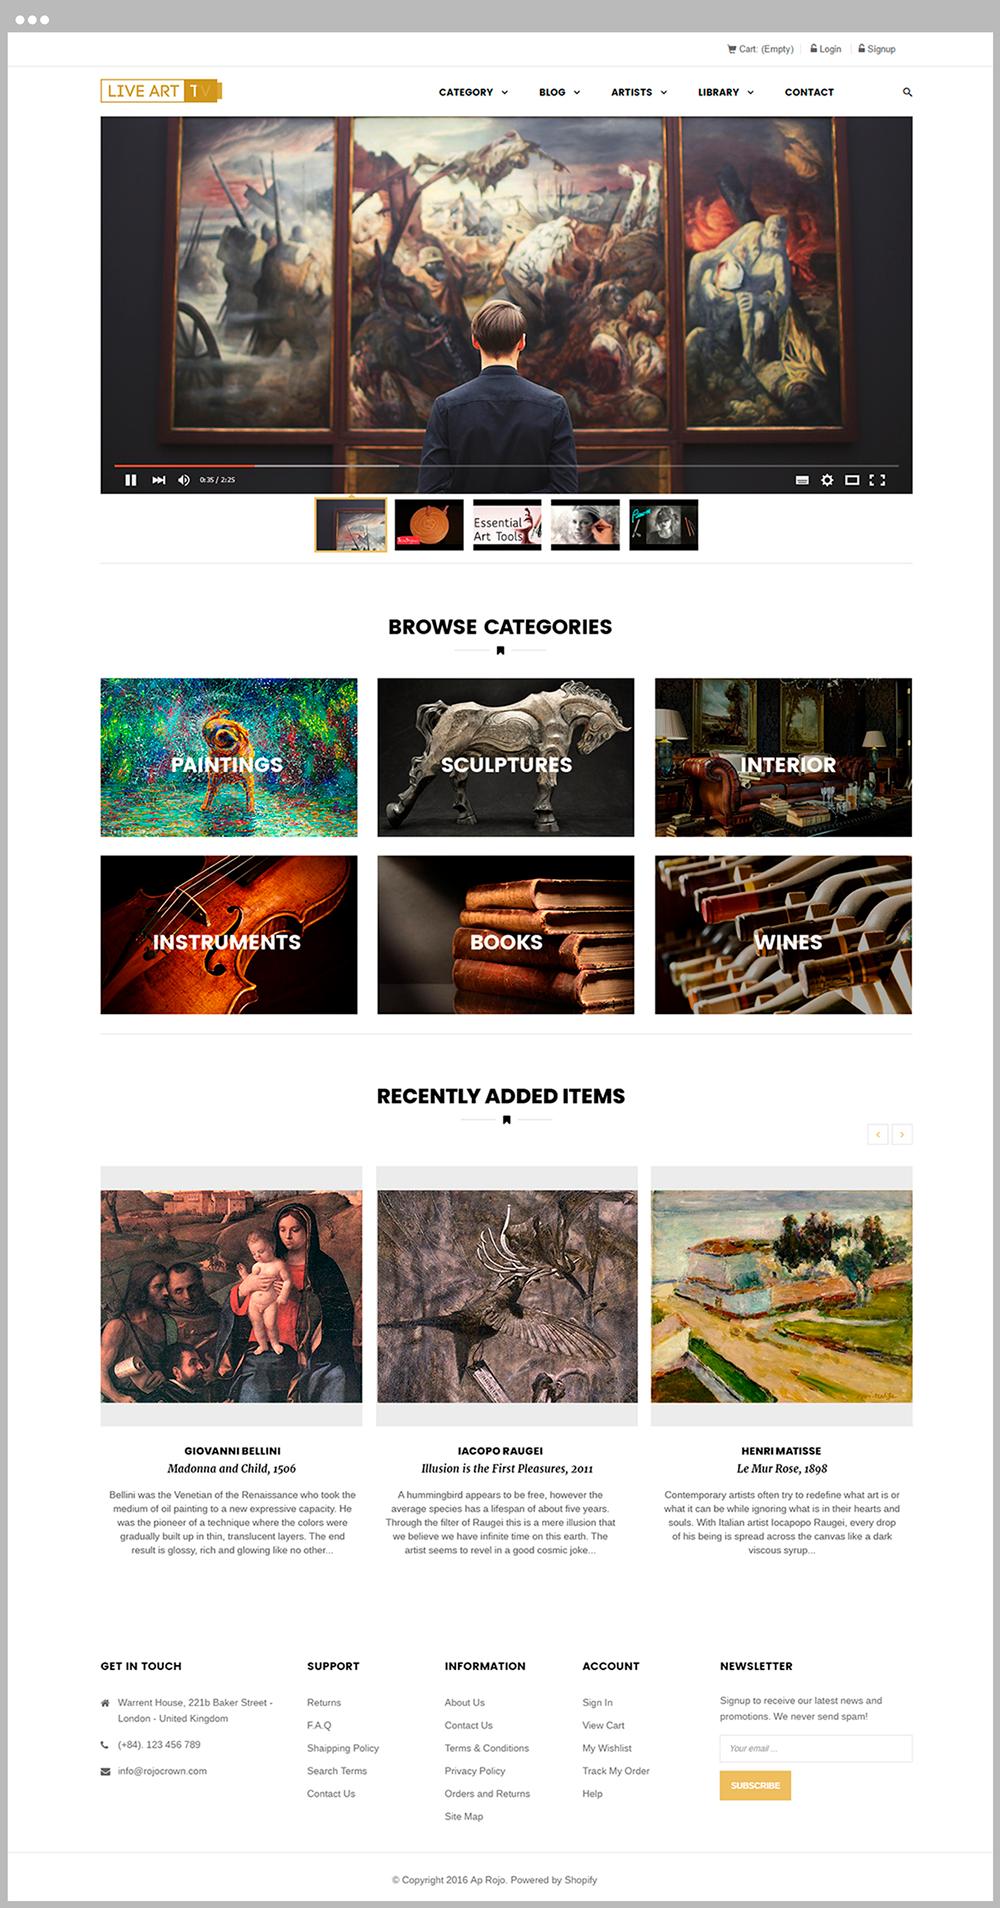 Live Art TV marketplace development